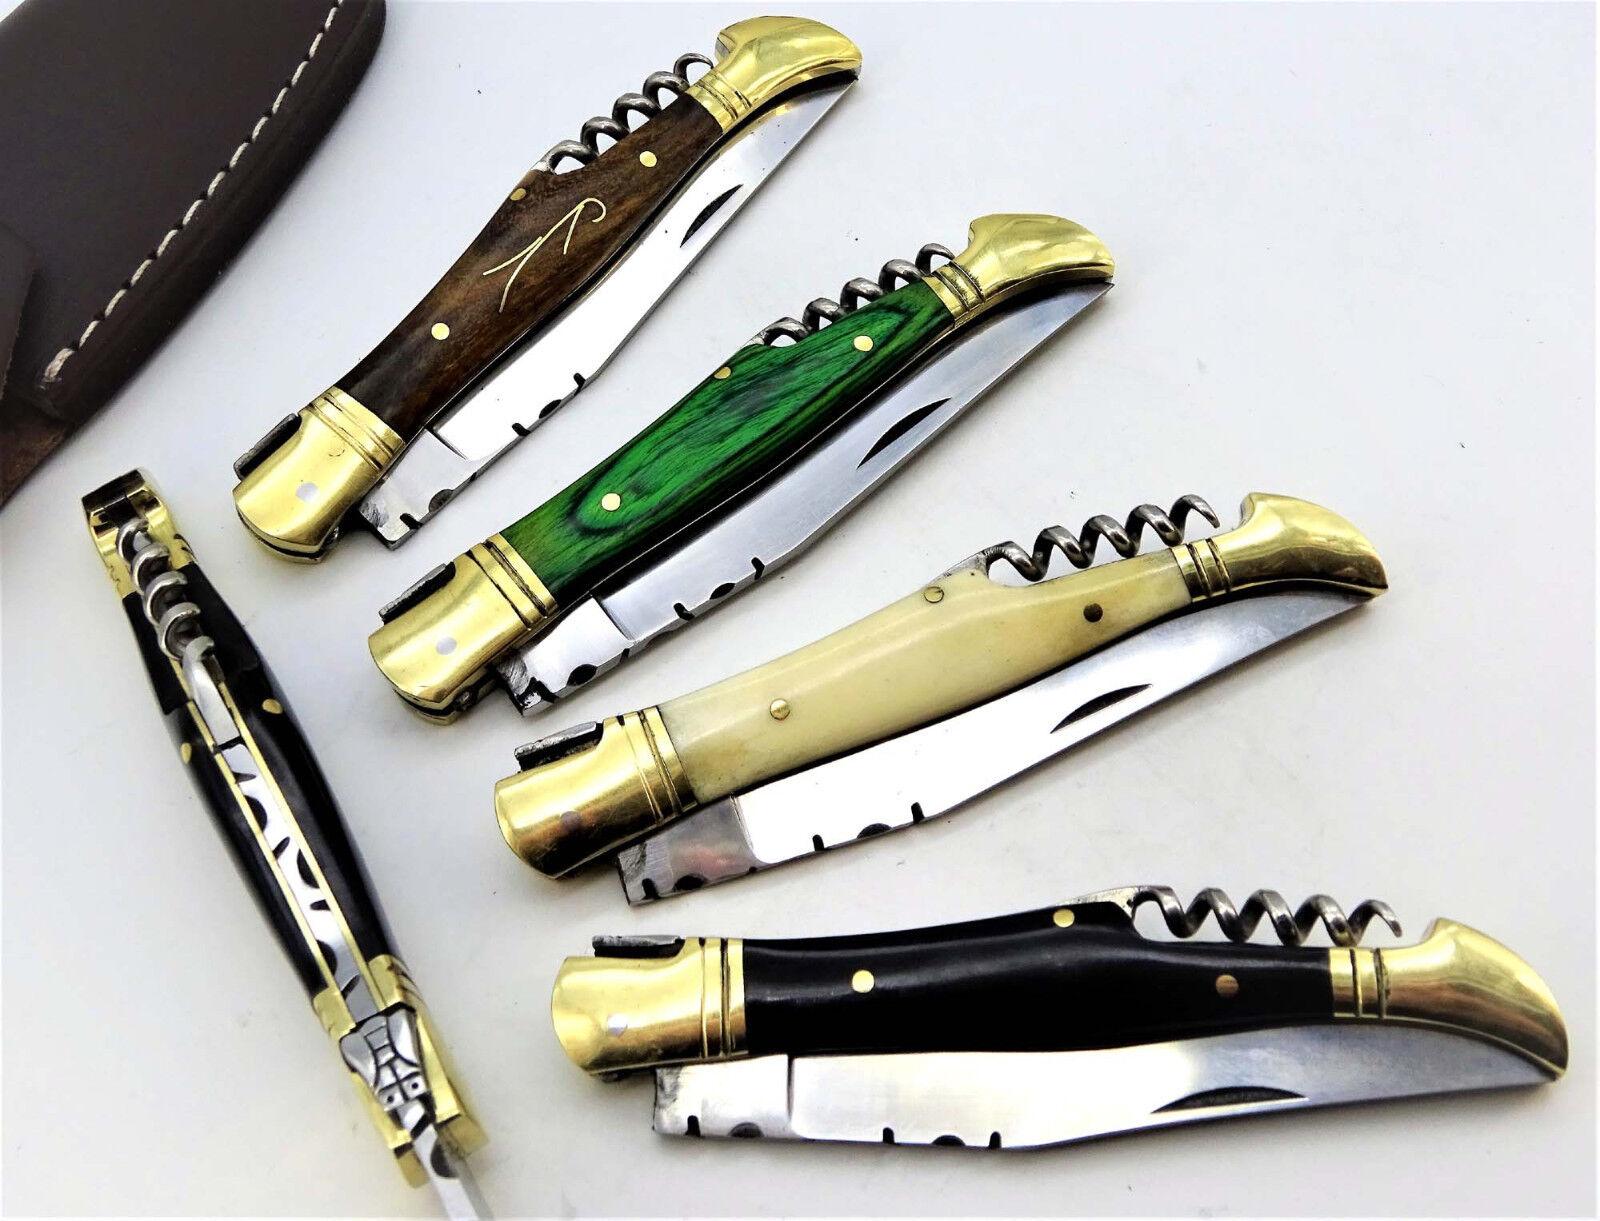 Couteau de Poche Poche Poche Laguiole Couteau de poche couteau pliant laguiolmesser couteau de chasse (rv3) c9e8ba